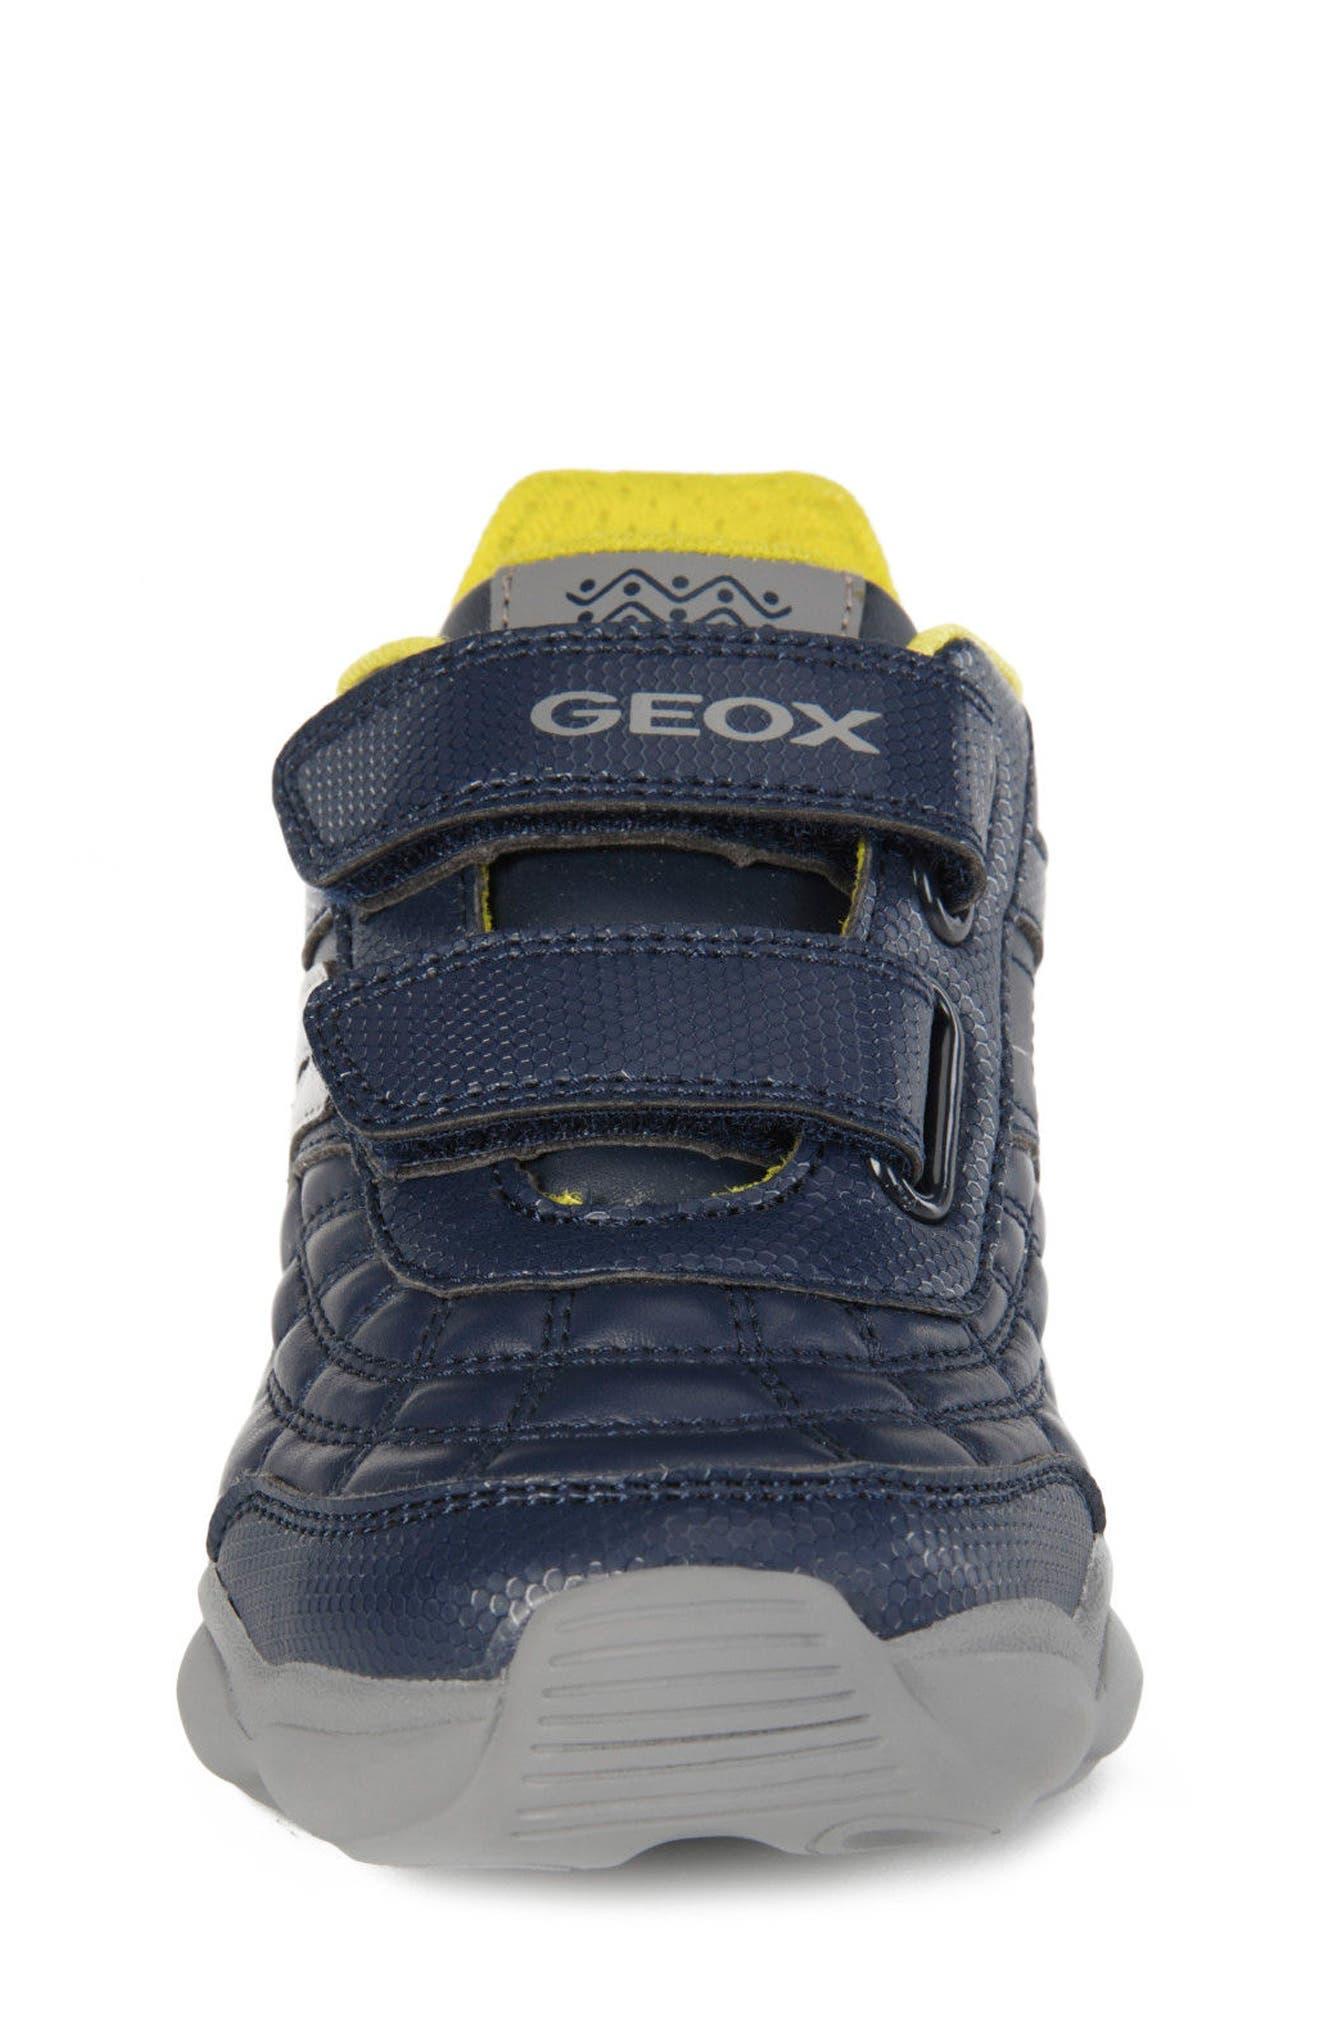 Munfrey Sneaker,                             Alternate thumbnail 4, color,                             Navy/ Grey